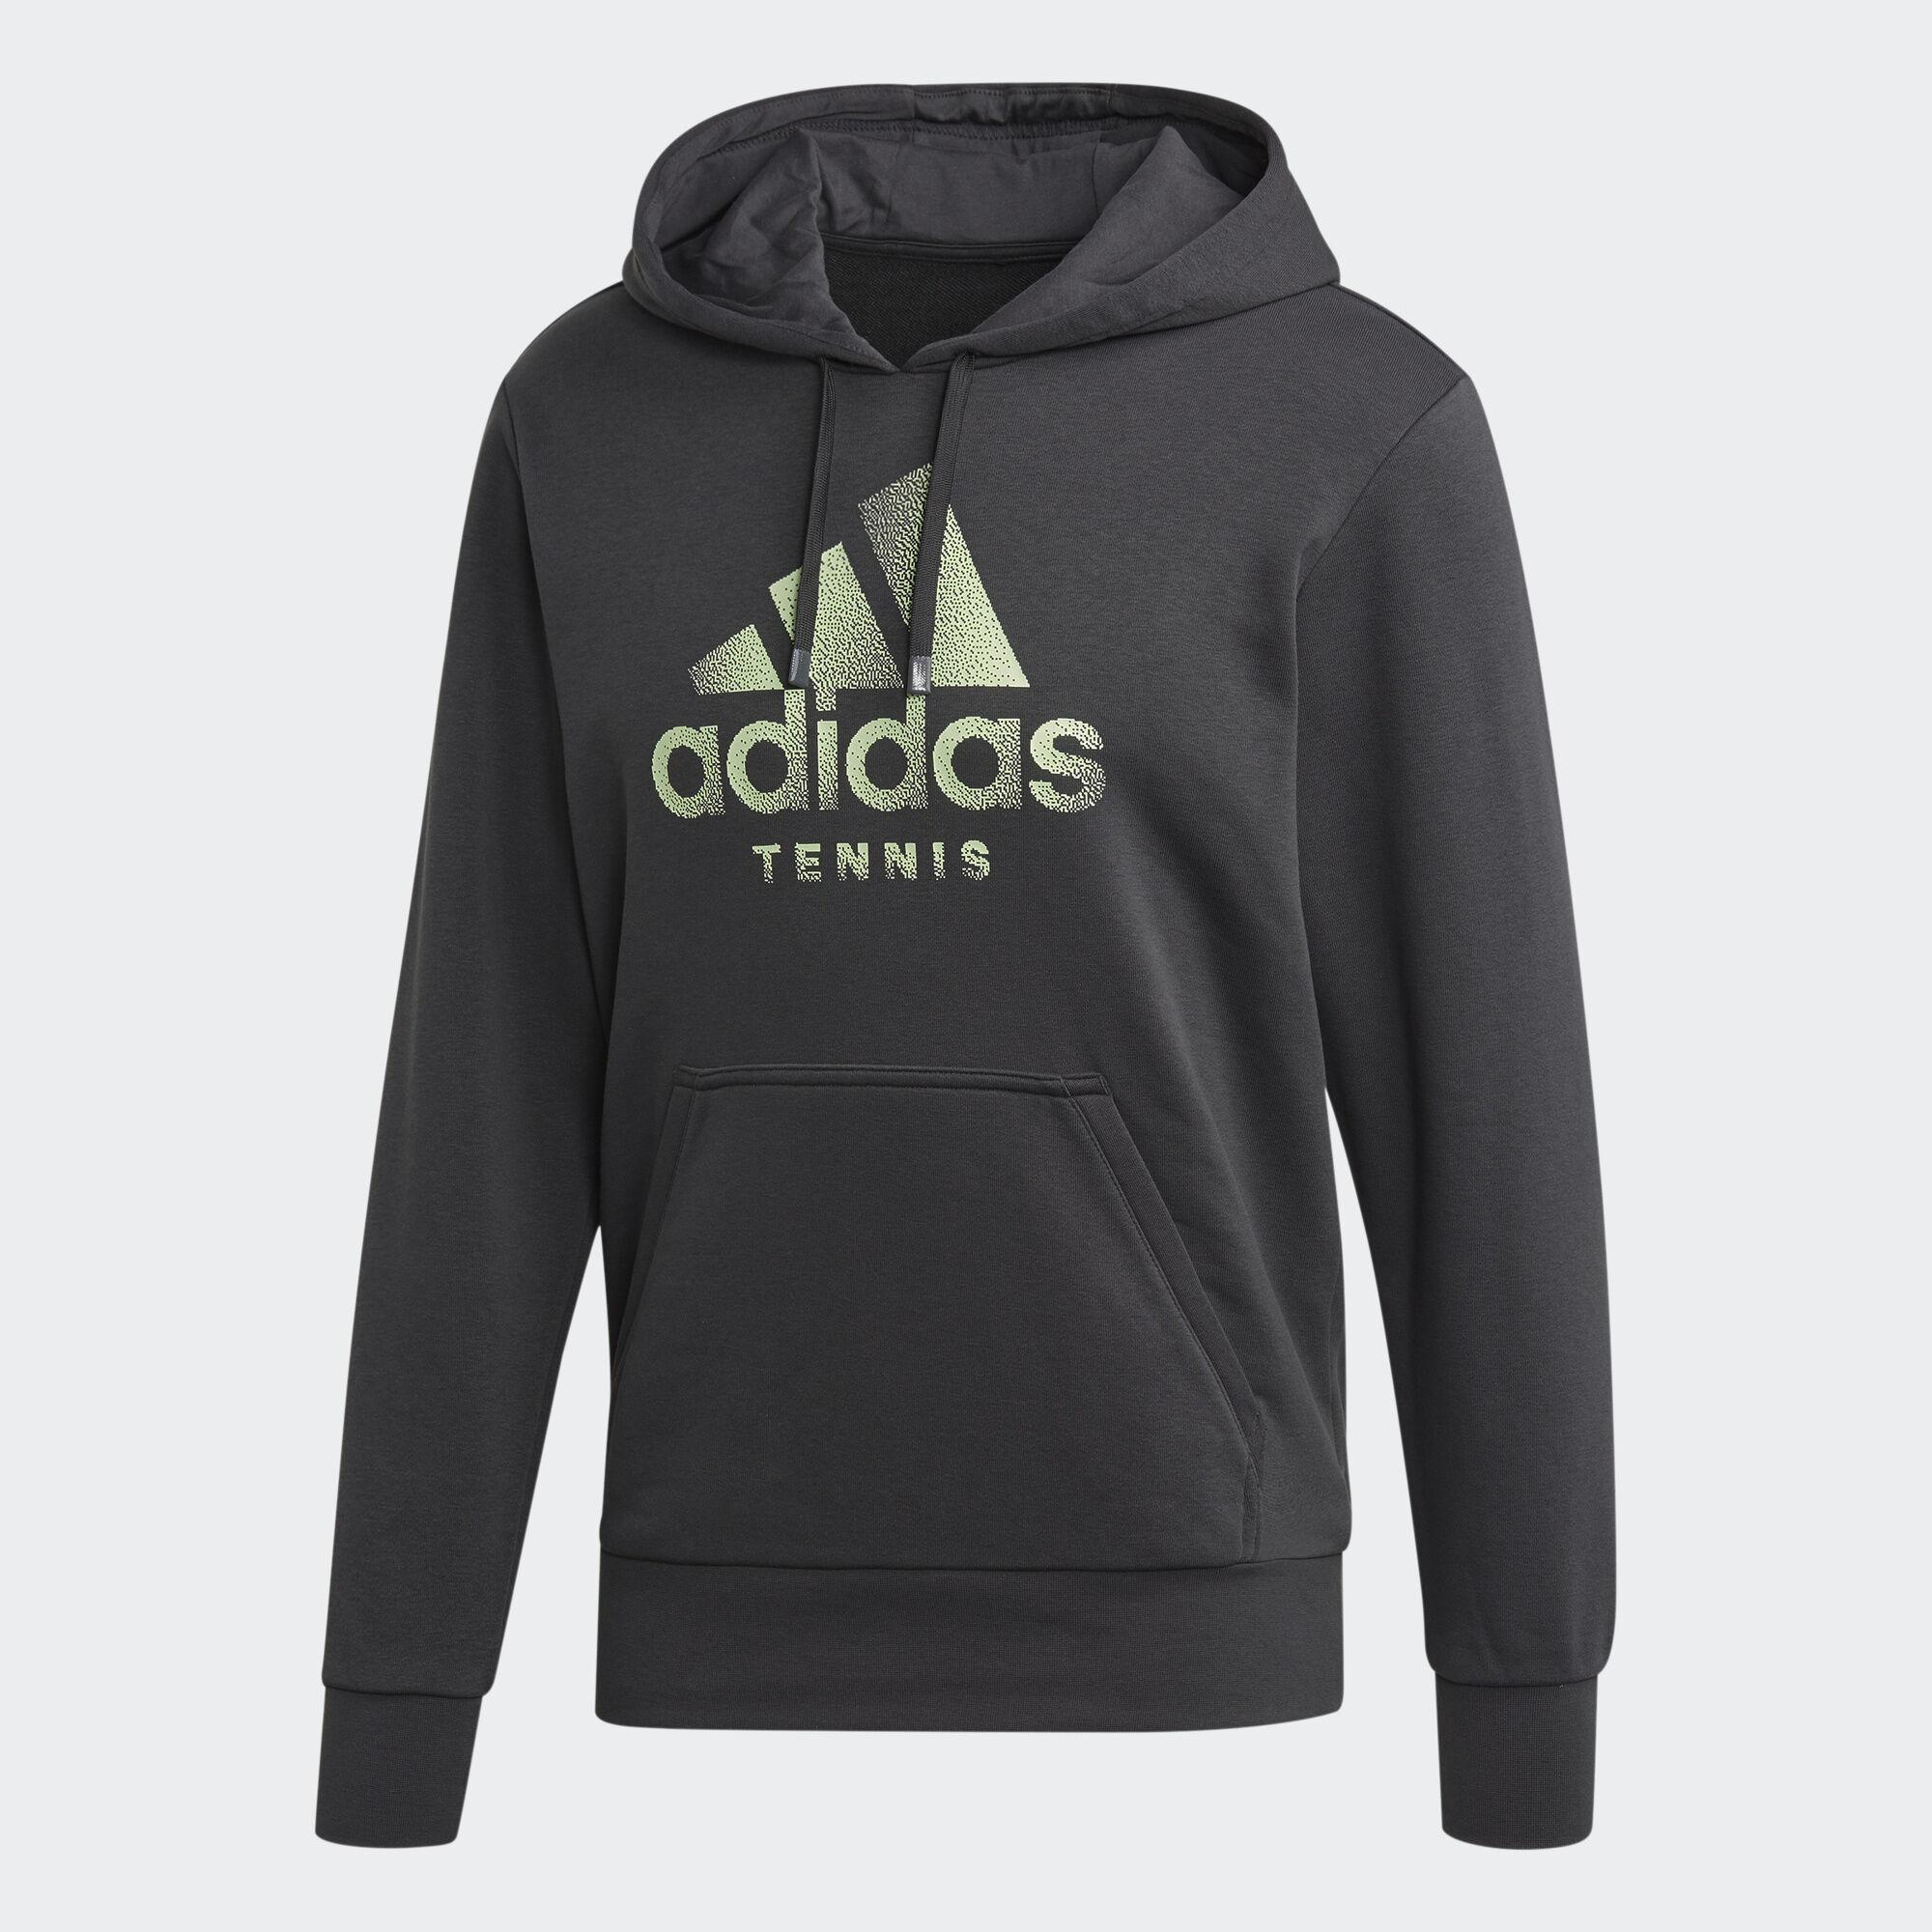 https://www.tennisnuts.com/images/product/full/FJ3887_A.jpg